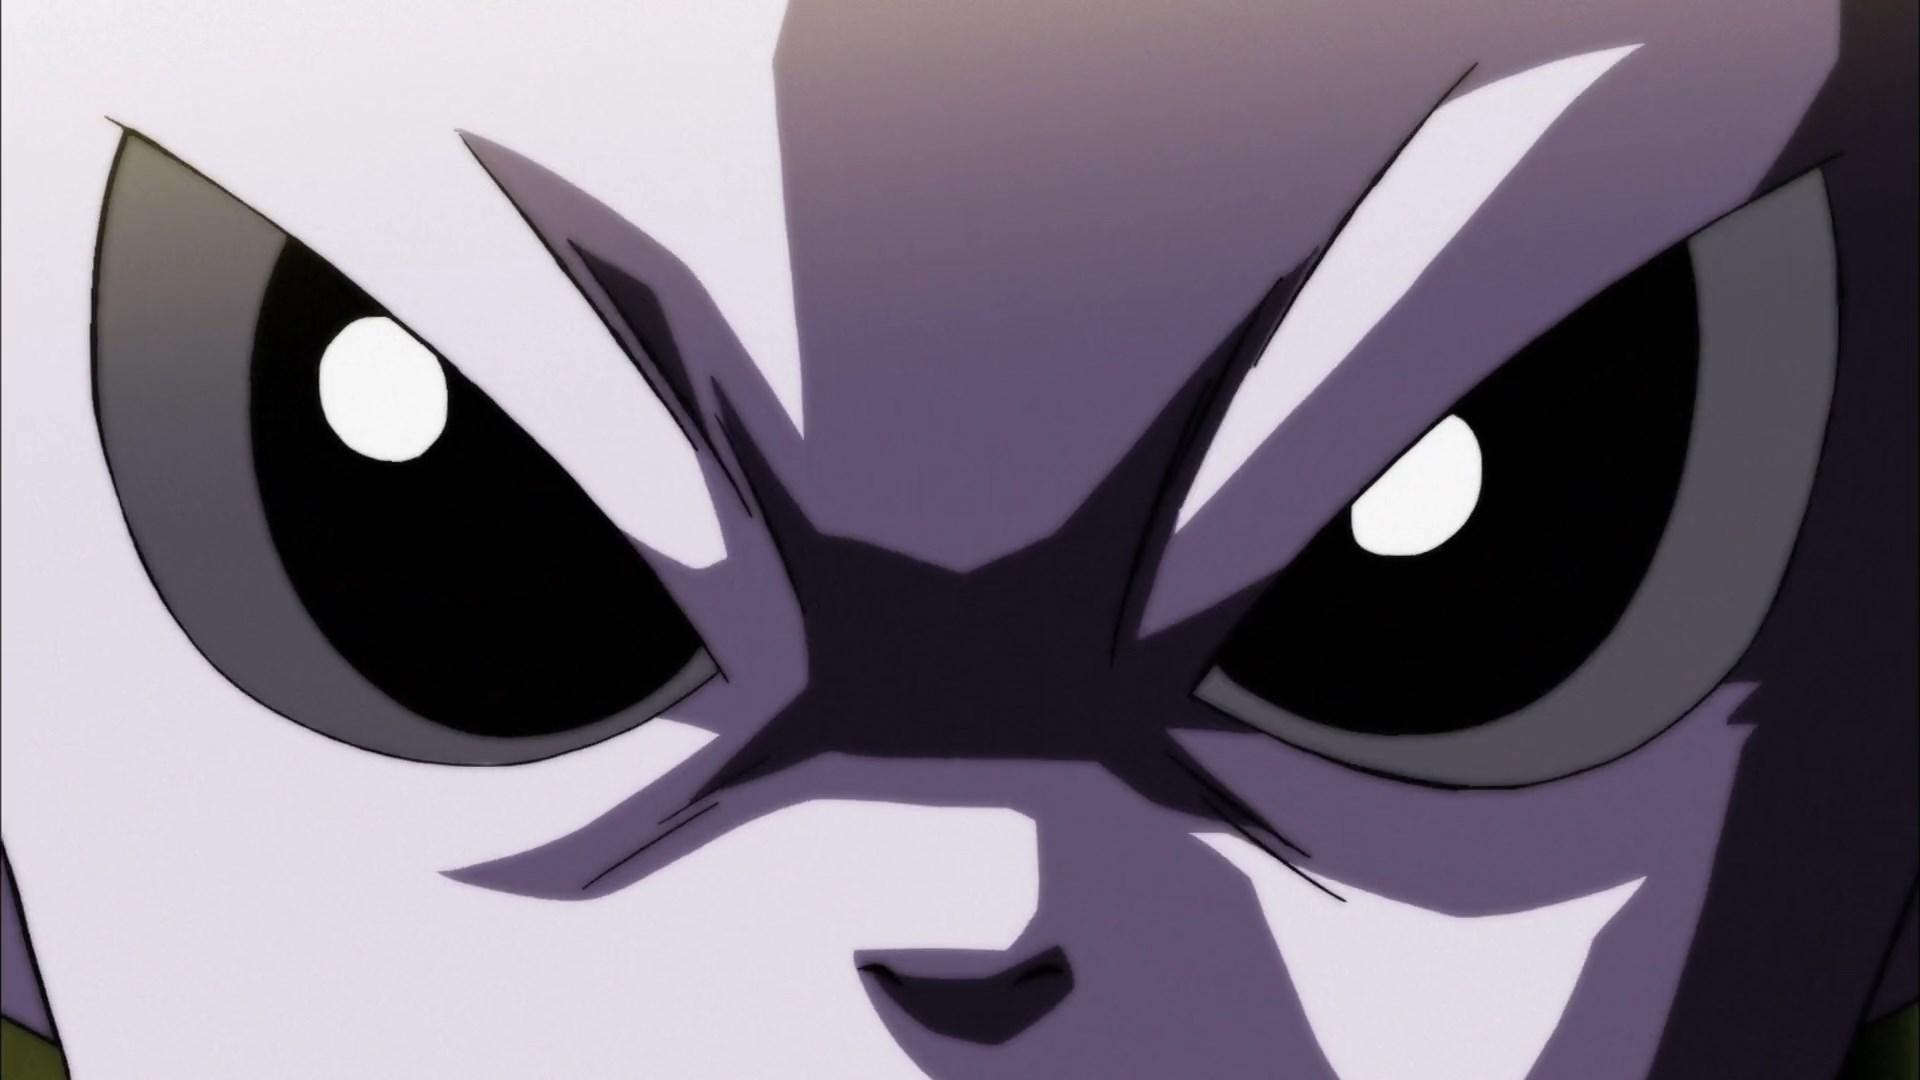 [HorribleSubs] Dragon Ball Super - 121 [1080p].mkv_snapshot_23.11